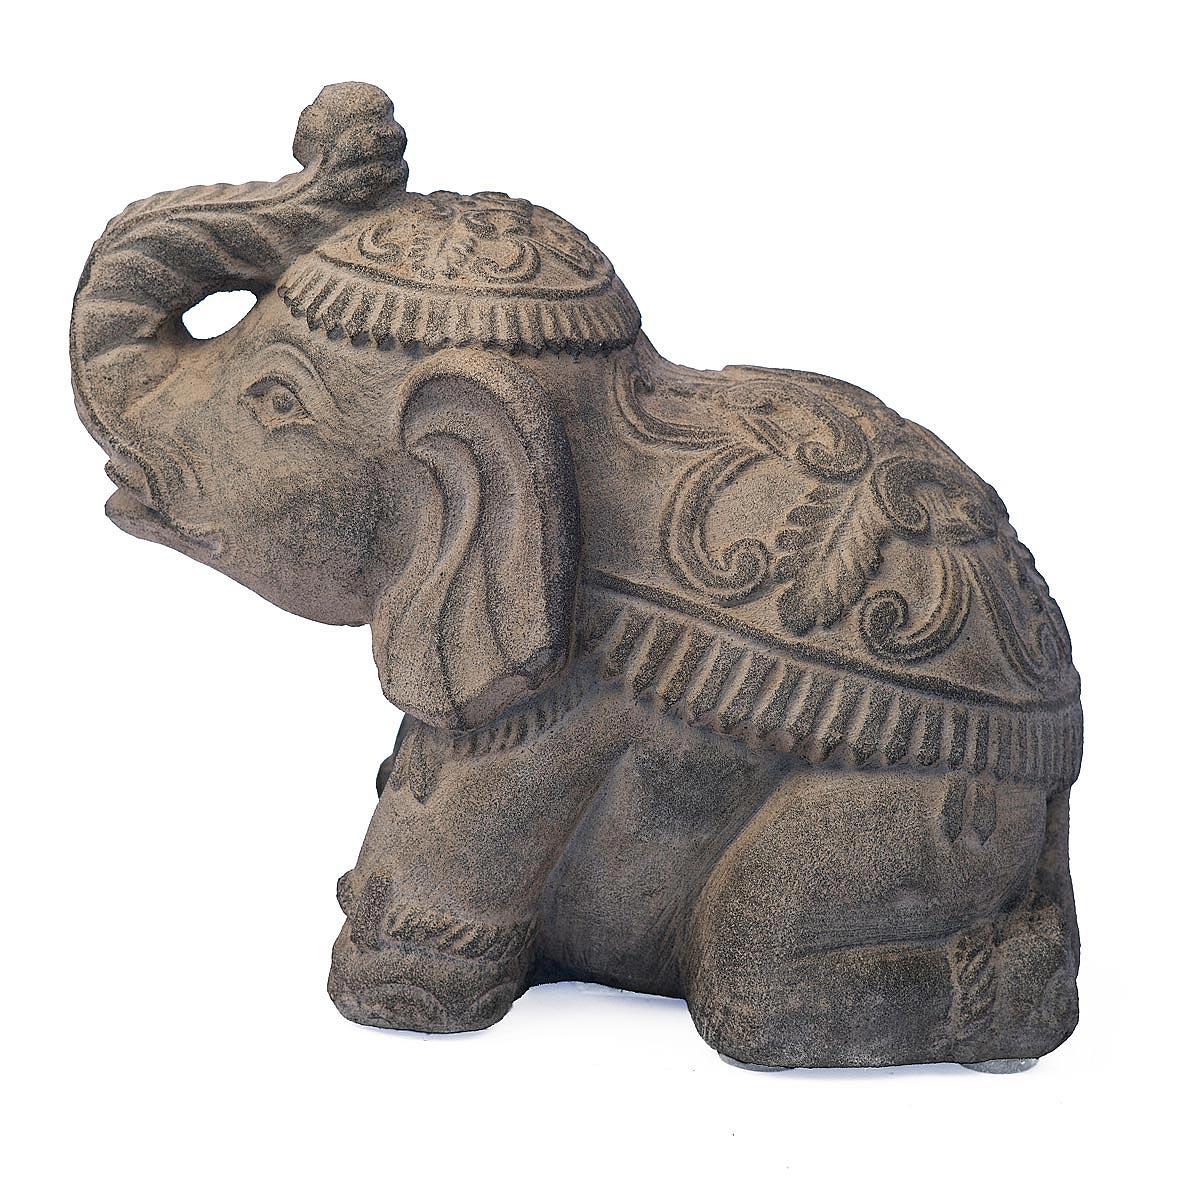 Elephant Garden Sculpture garden decor UncommonGoods